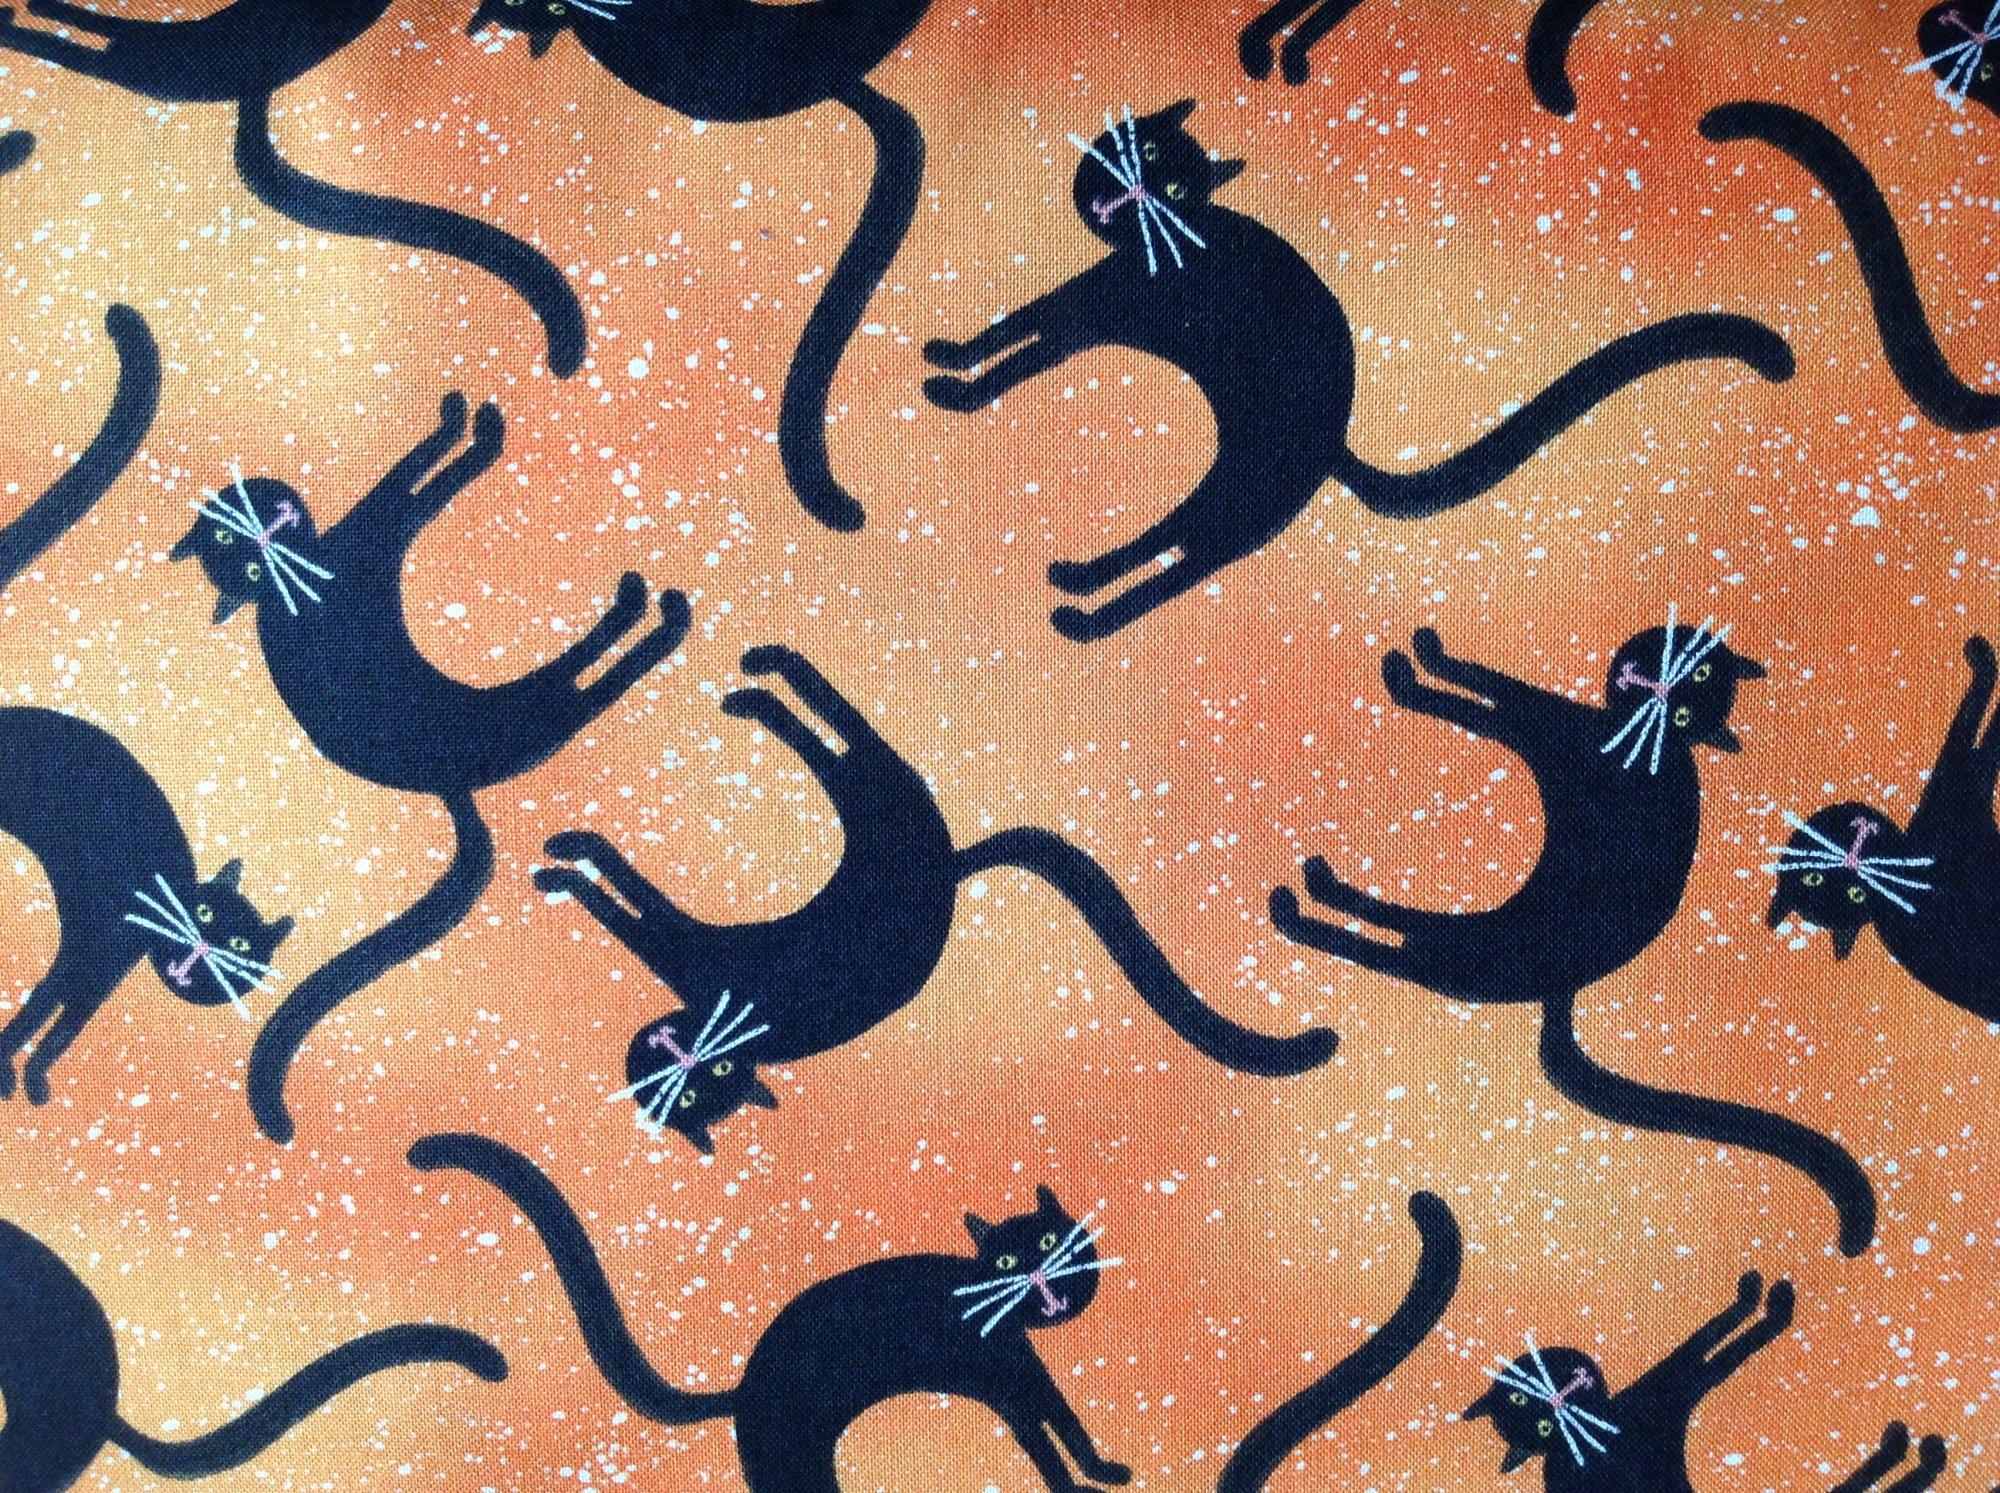 Spooky Vibes Cats on Orange